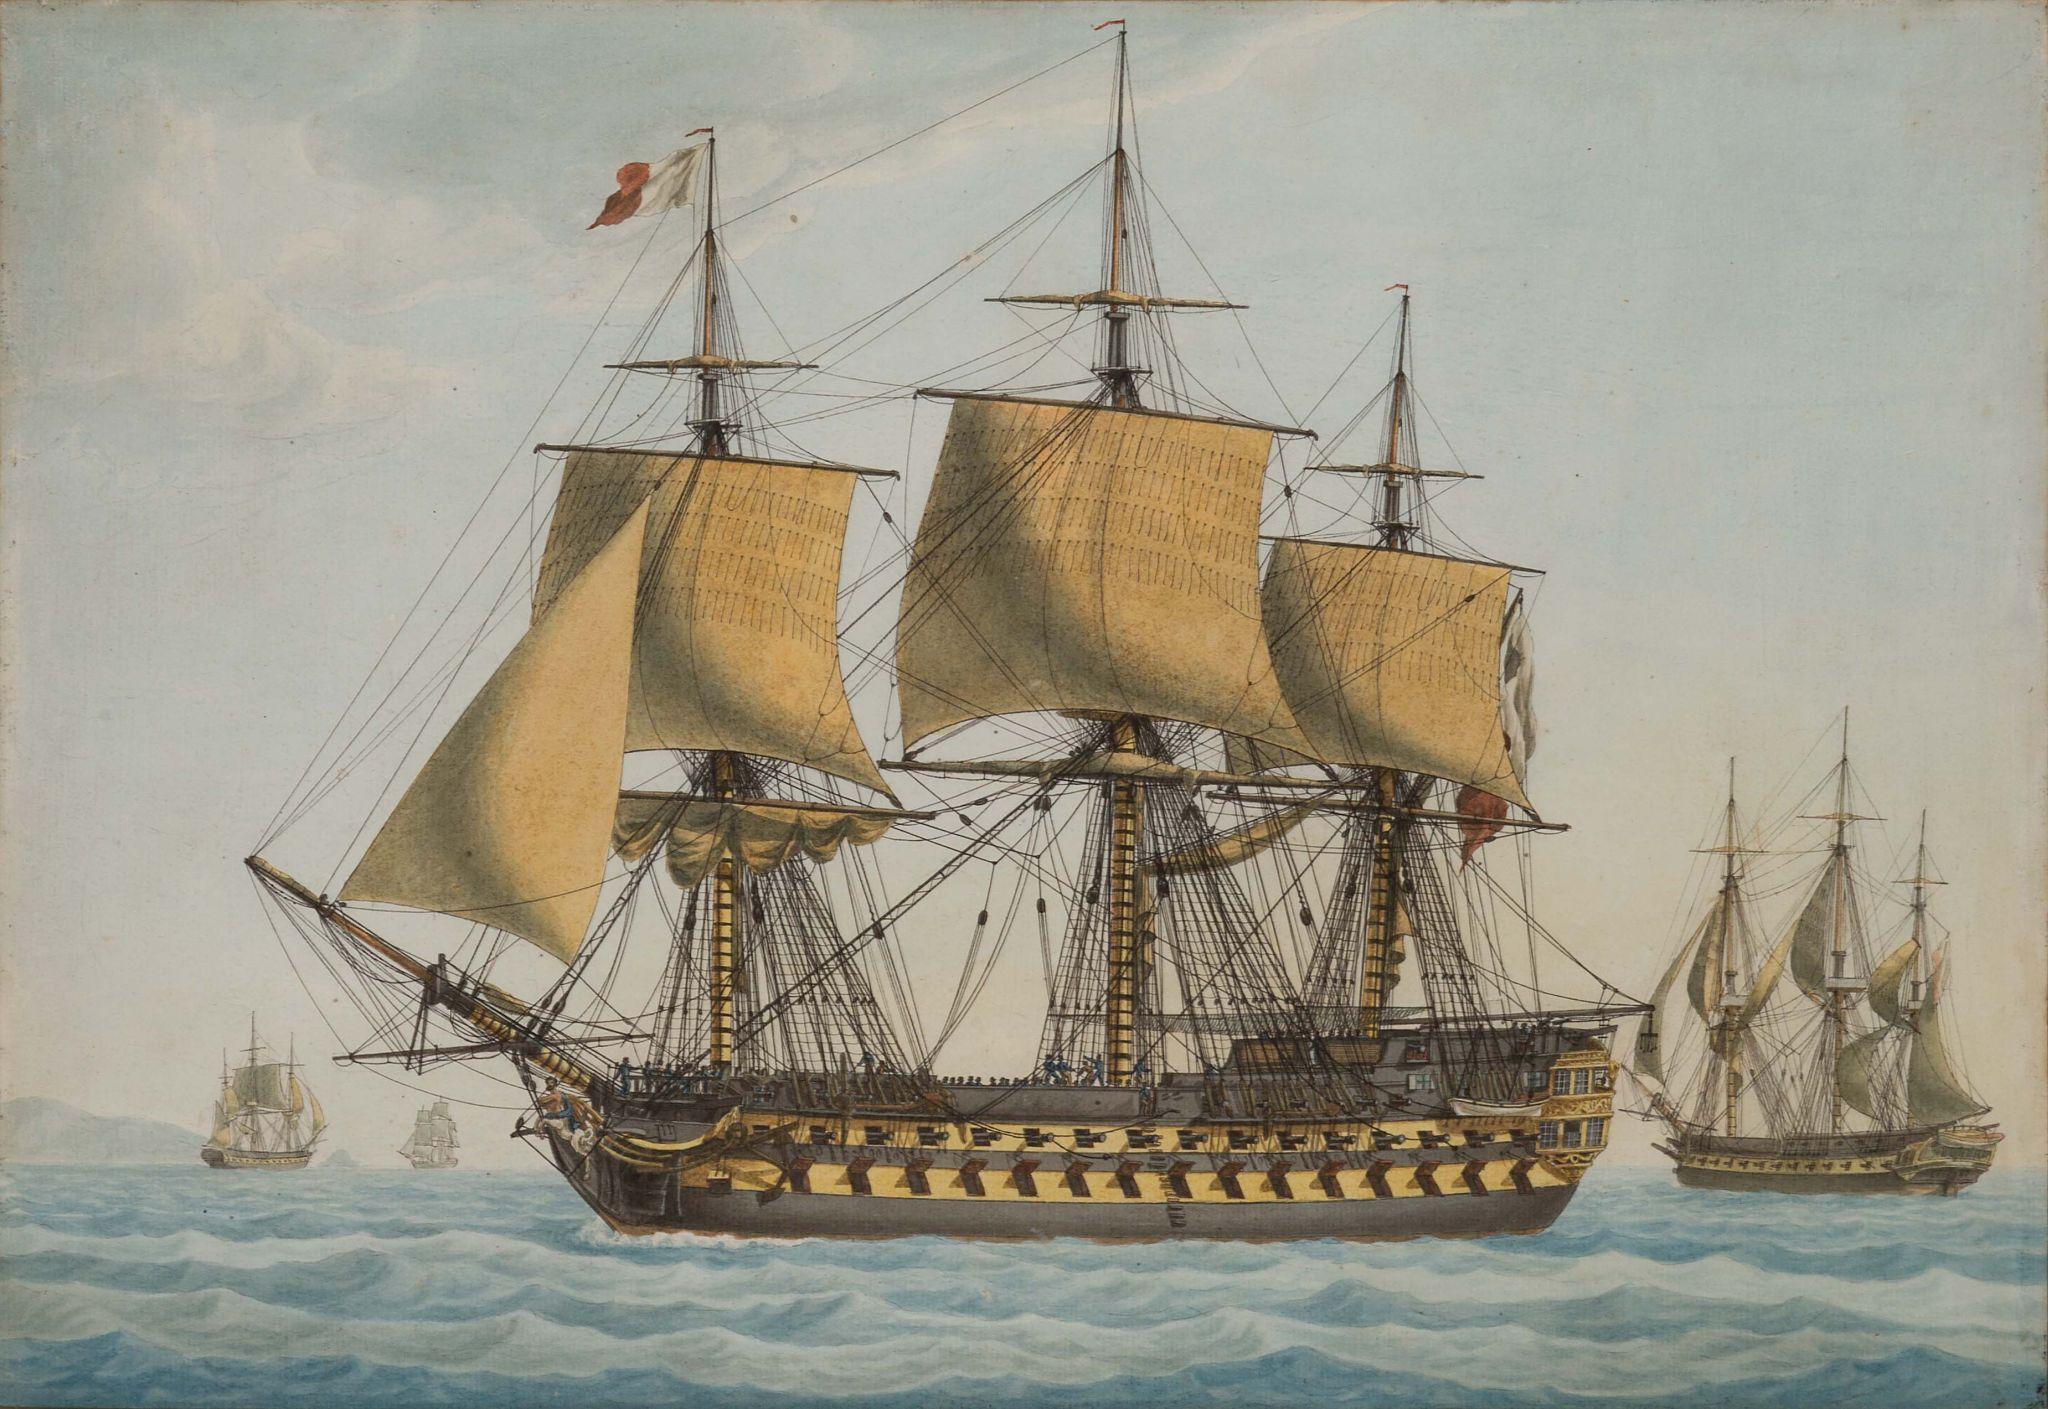 JOSEPH-ANGE ANTOINE ROUX (FRENCH, 1765-1835) - Image 2 of 15